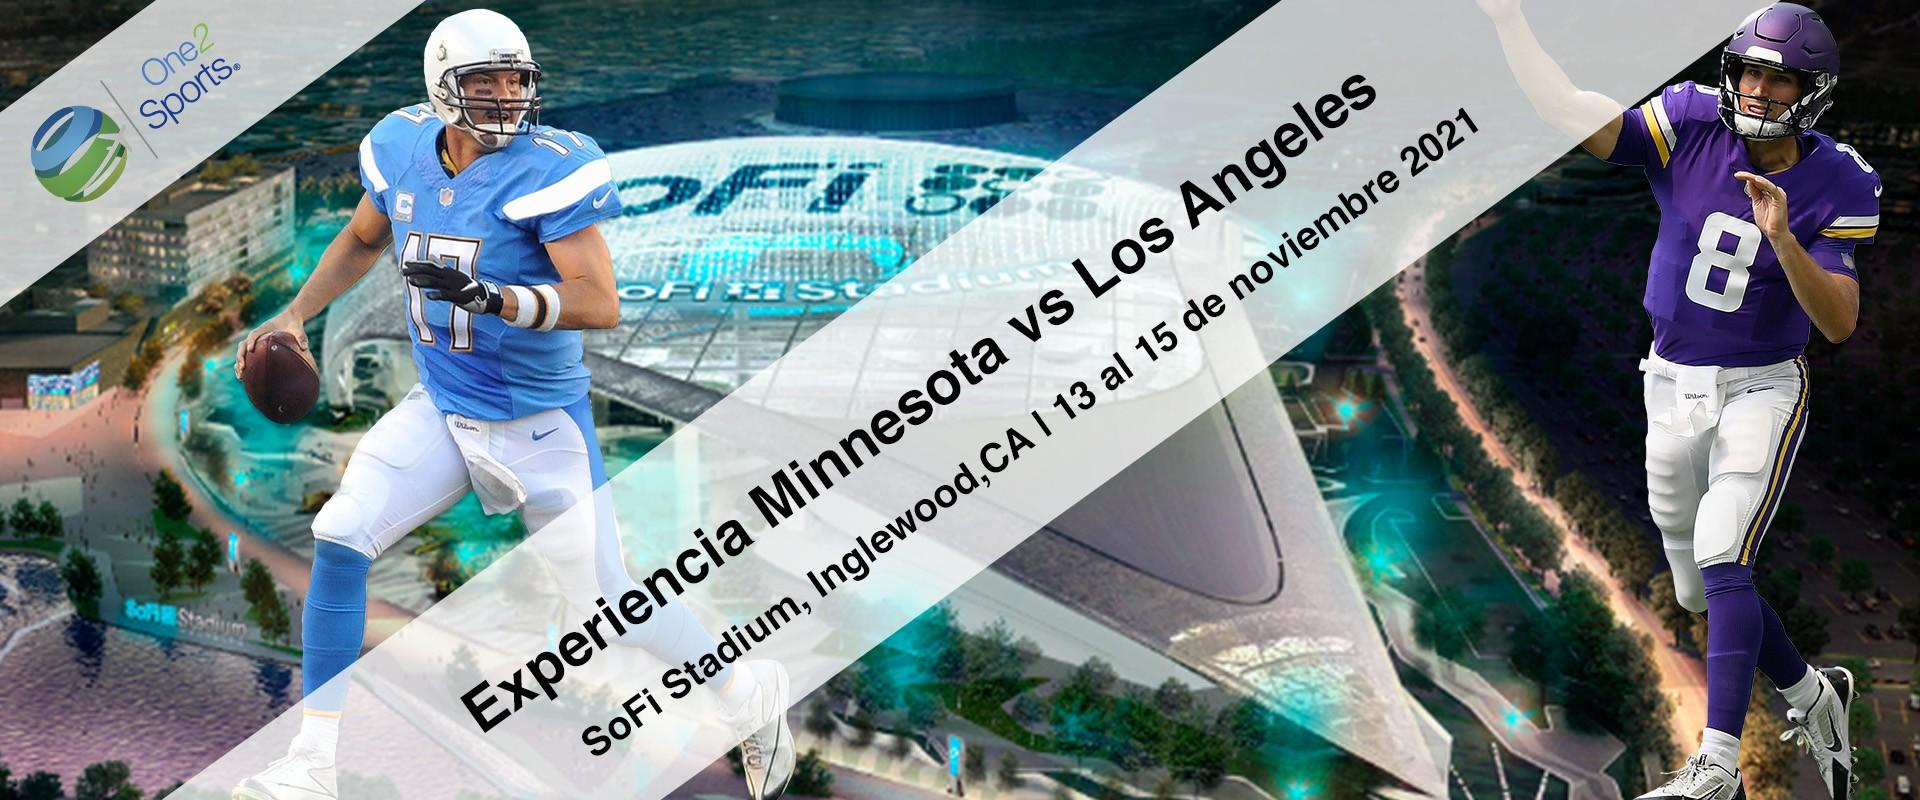 Los Angeles Chargers vs Minnesota